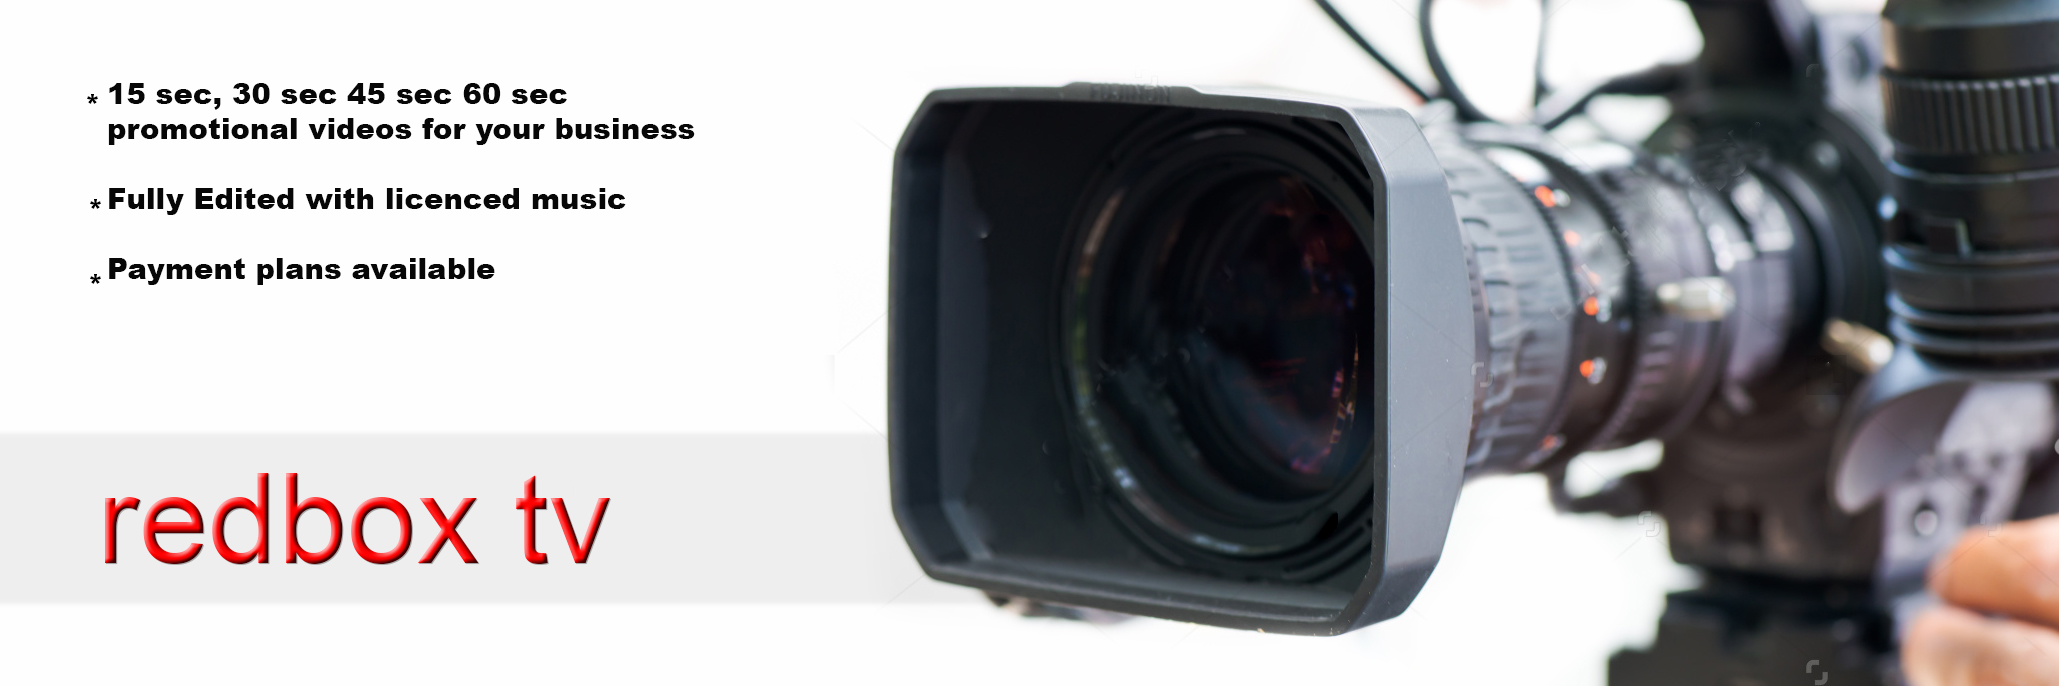 stock-photo-close-up-camera-working-314075093.jpg